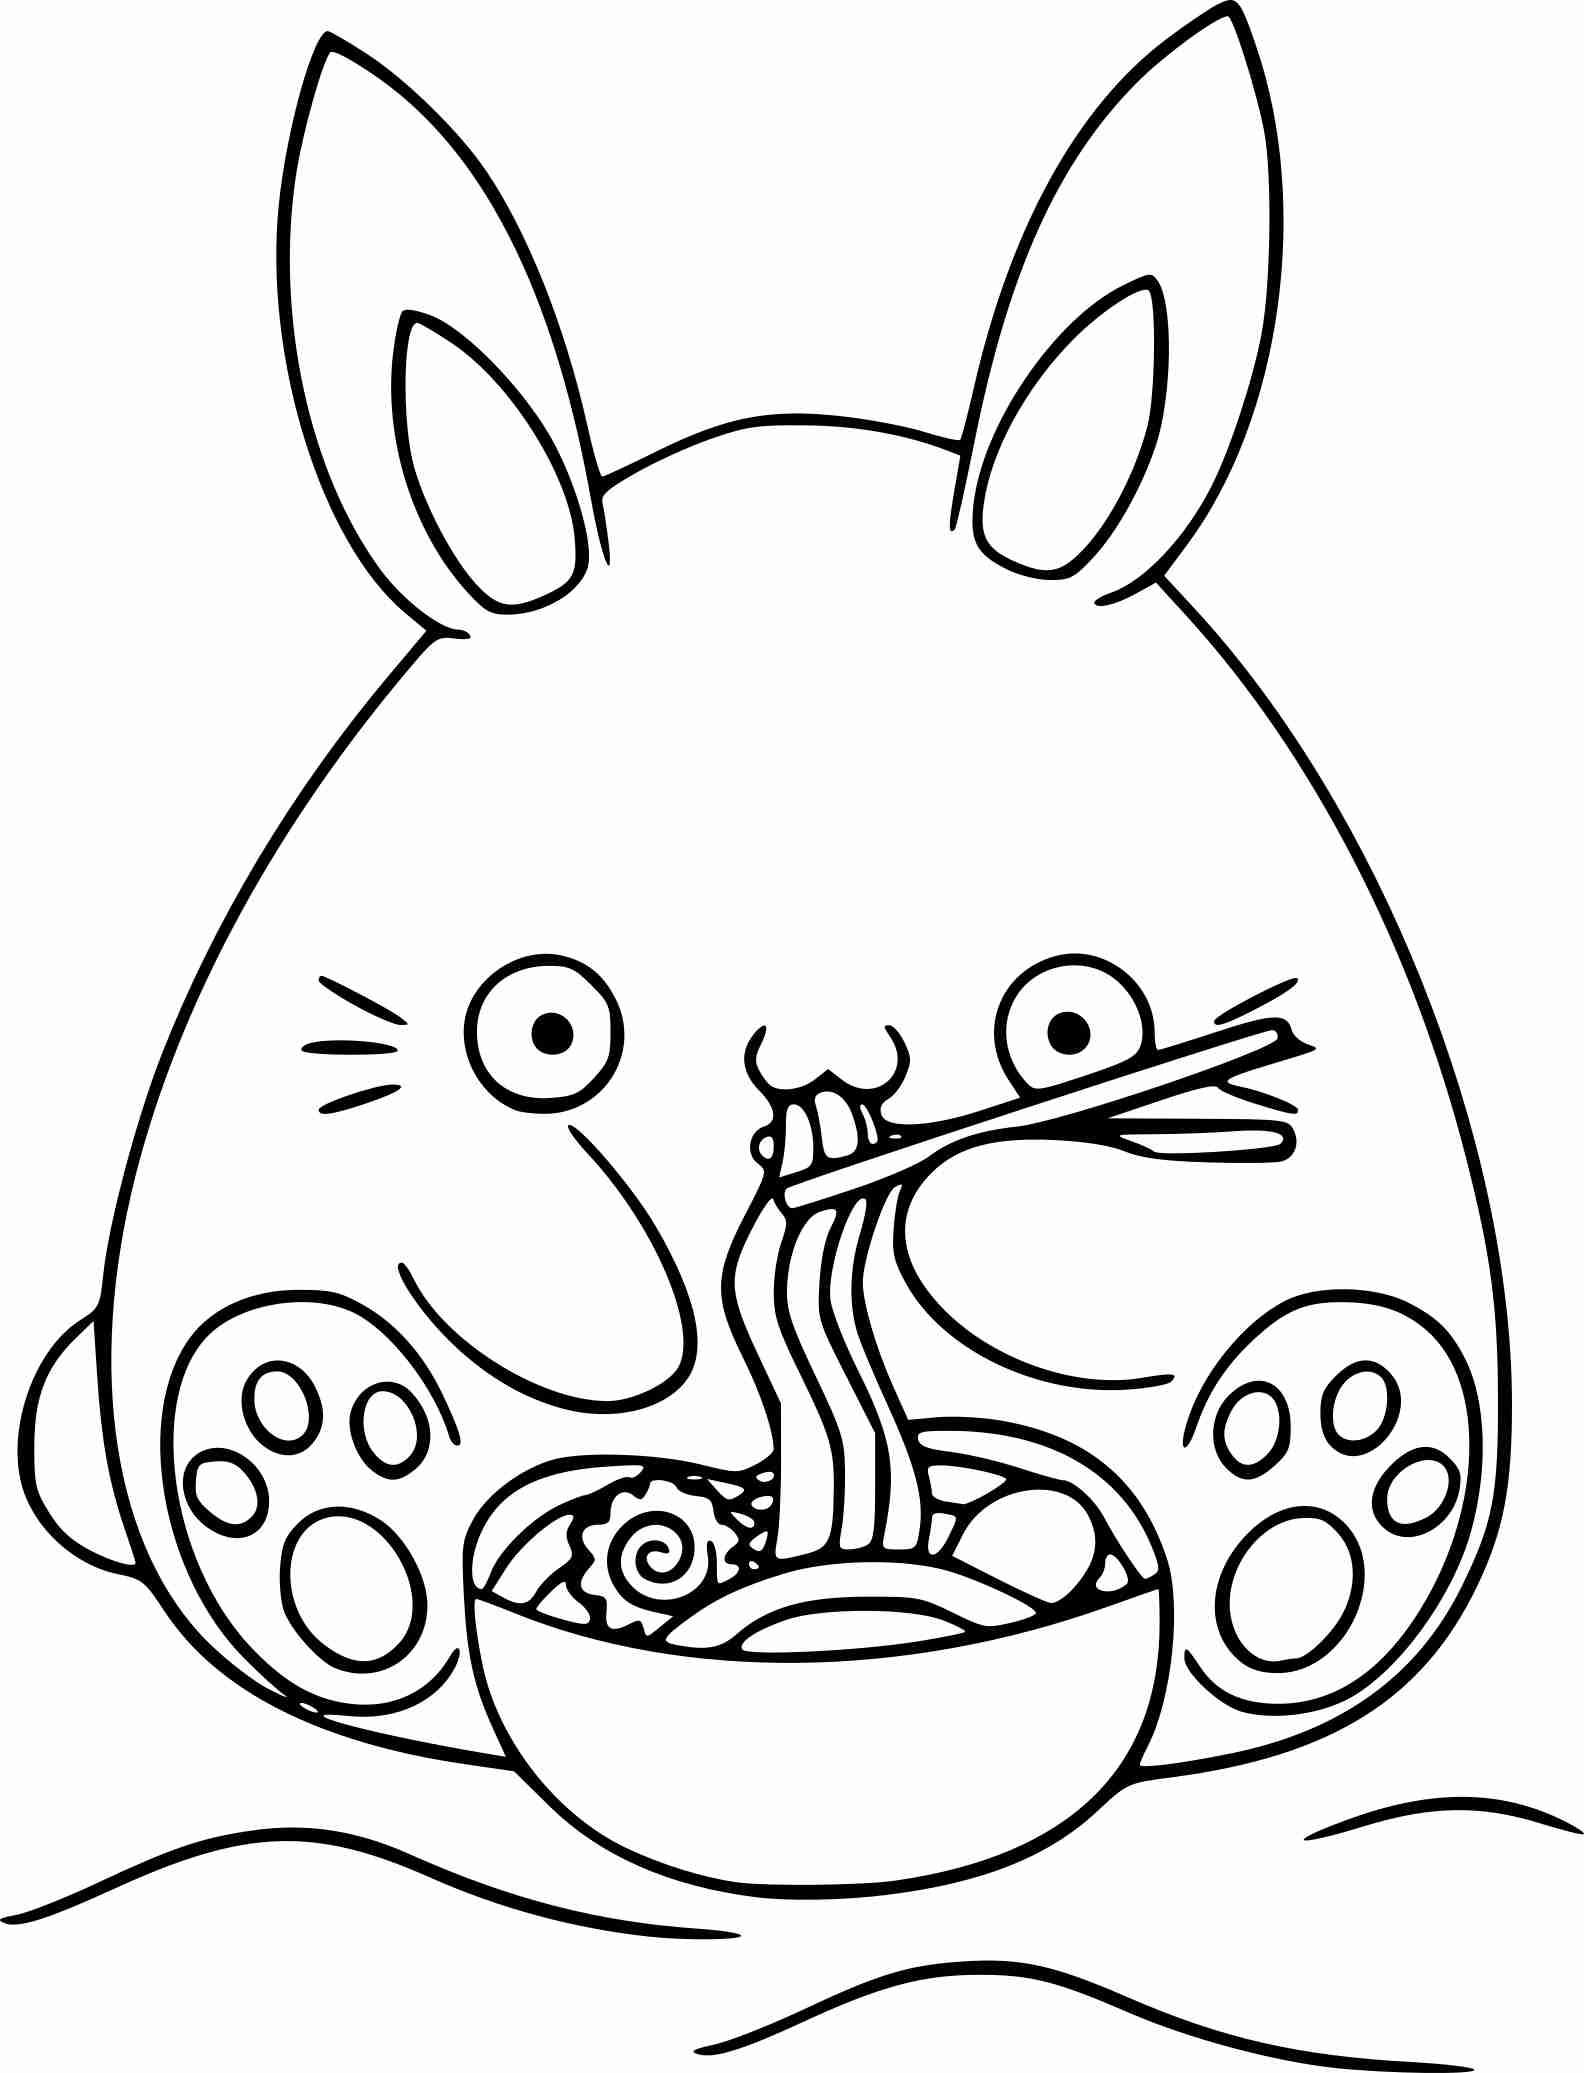 1584x2073 Kawaii Coloring Pages Free Download Best Adorable Page Olegratiy